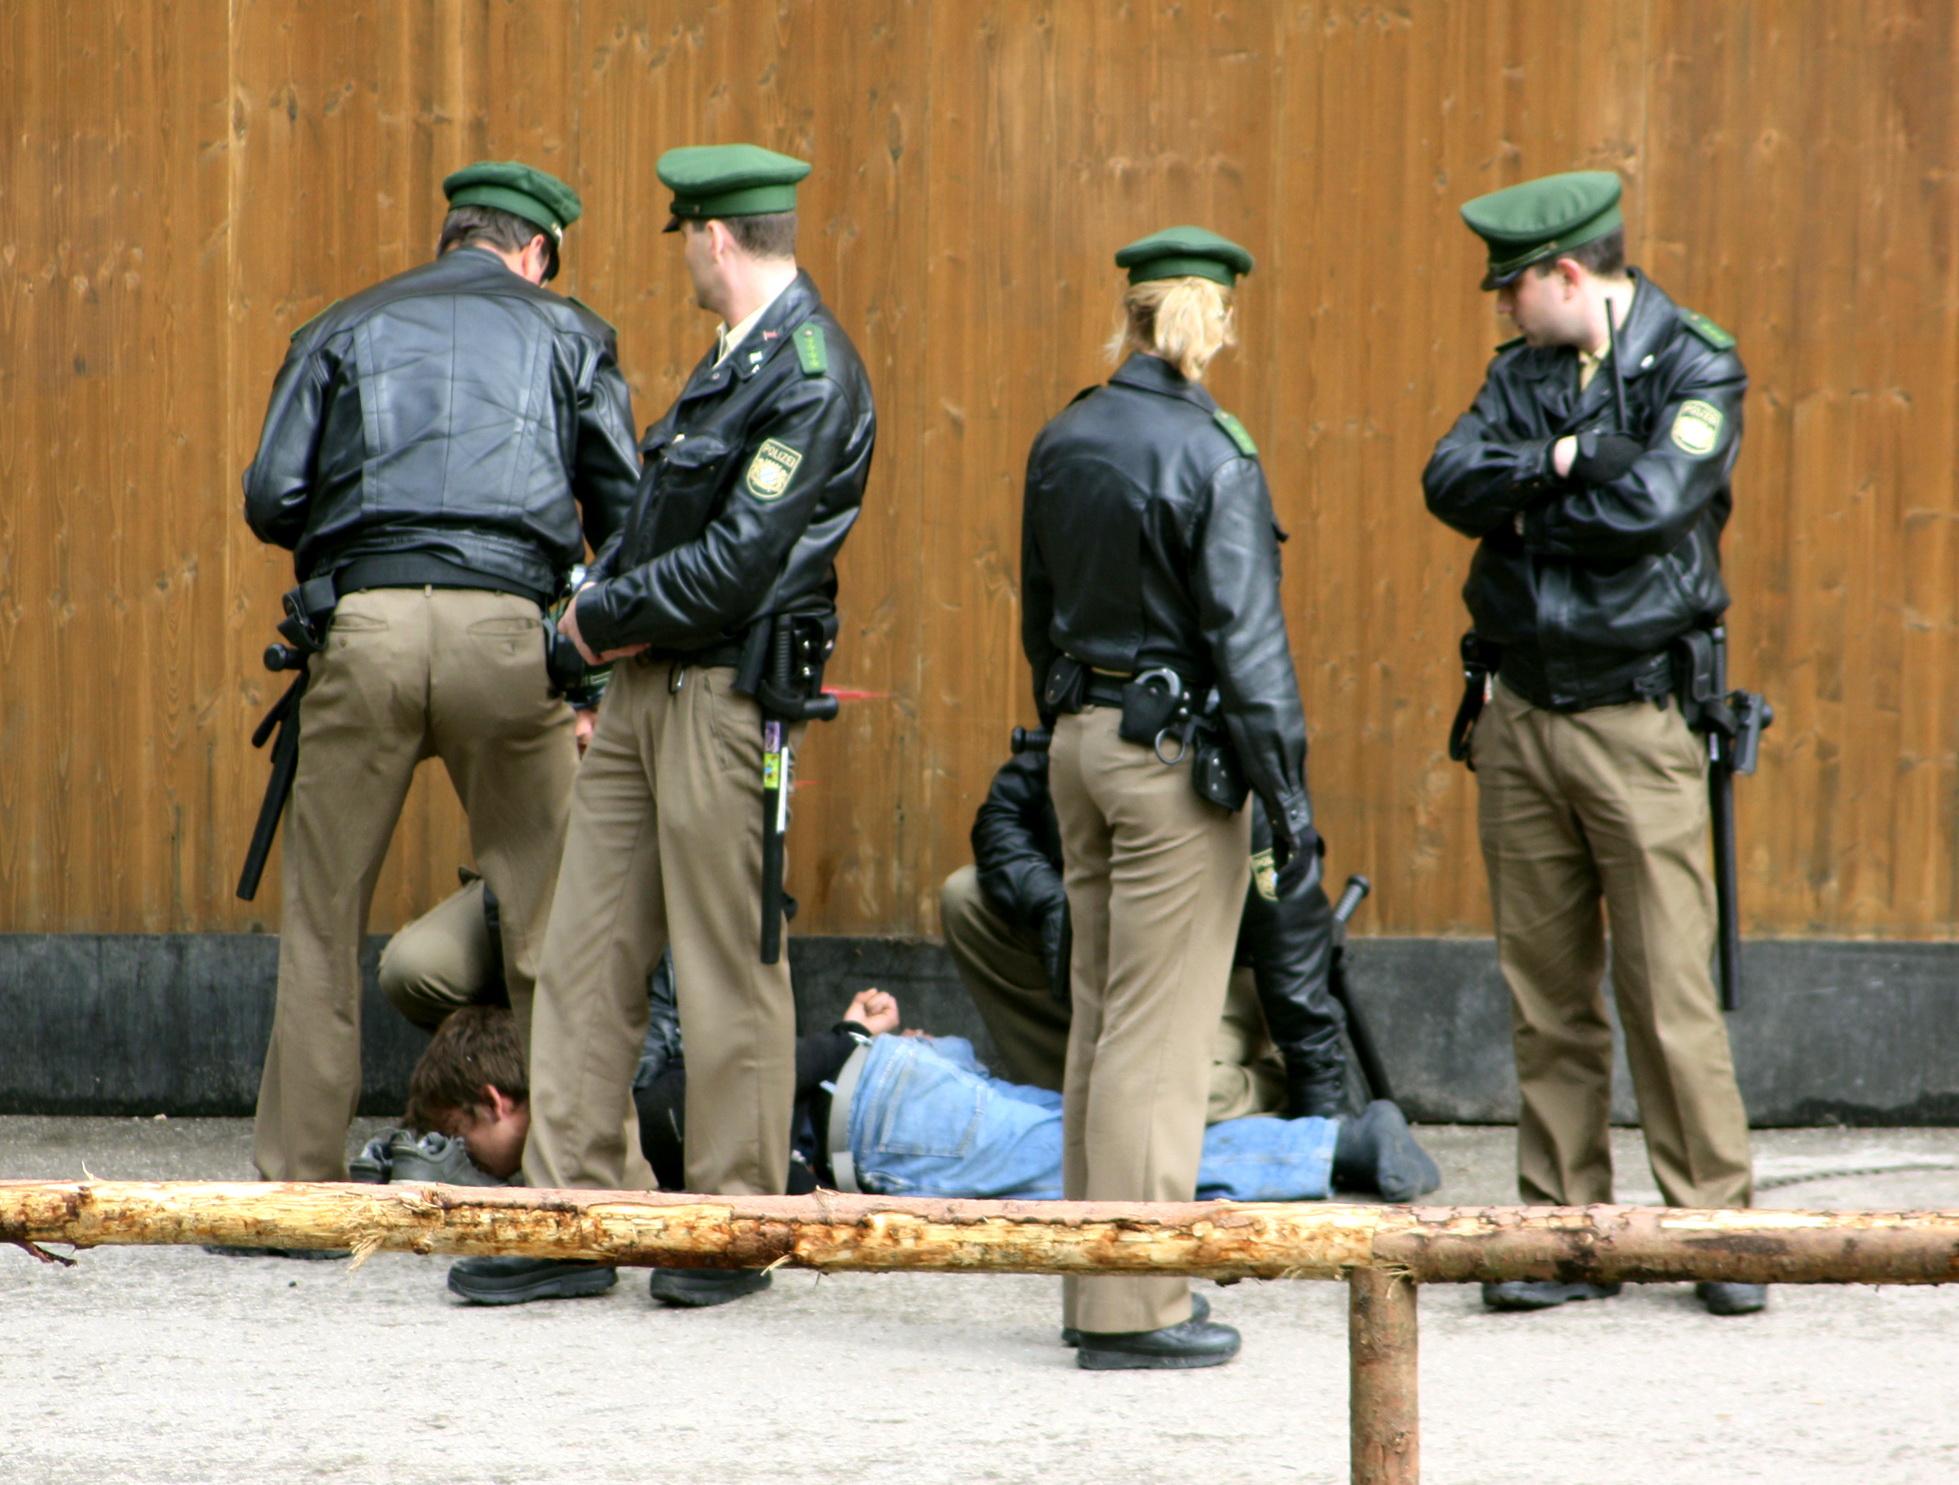 Festnahme eines betrunkenen Randalierers auf dem Oktoberfest, 23. September 2010